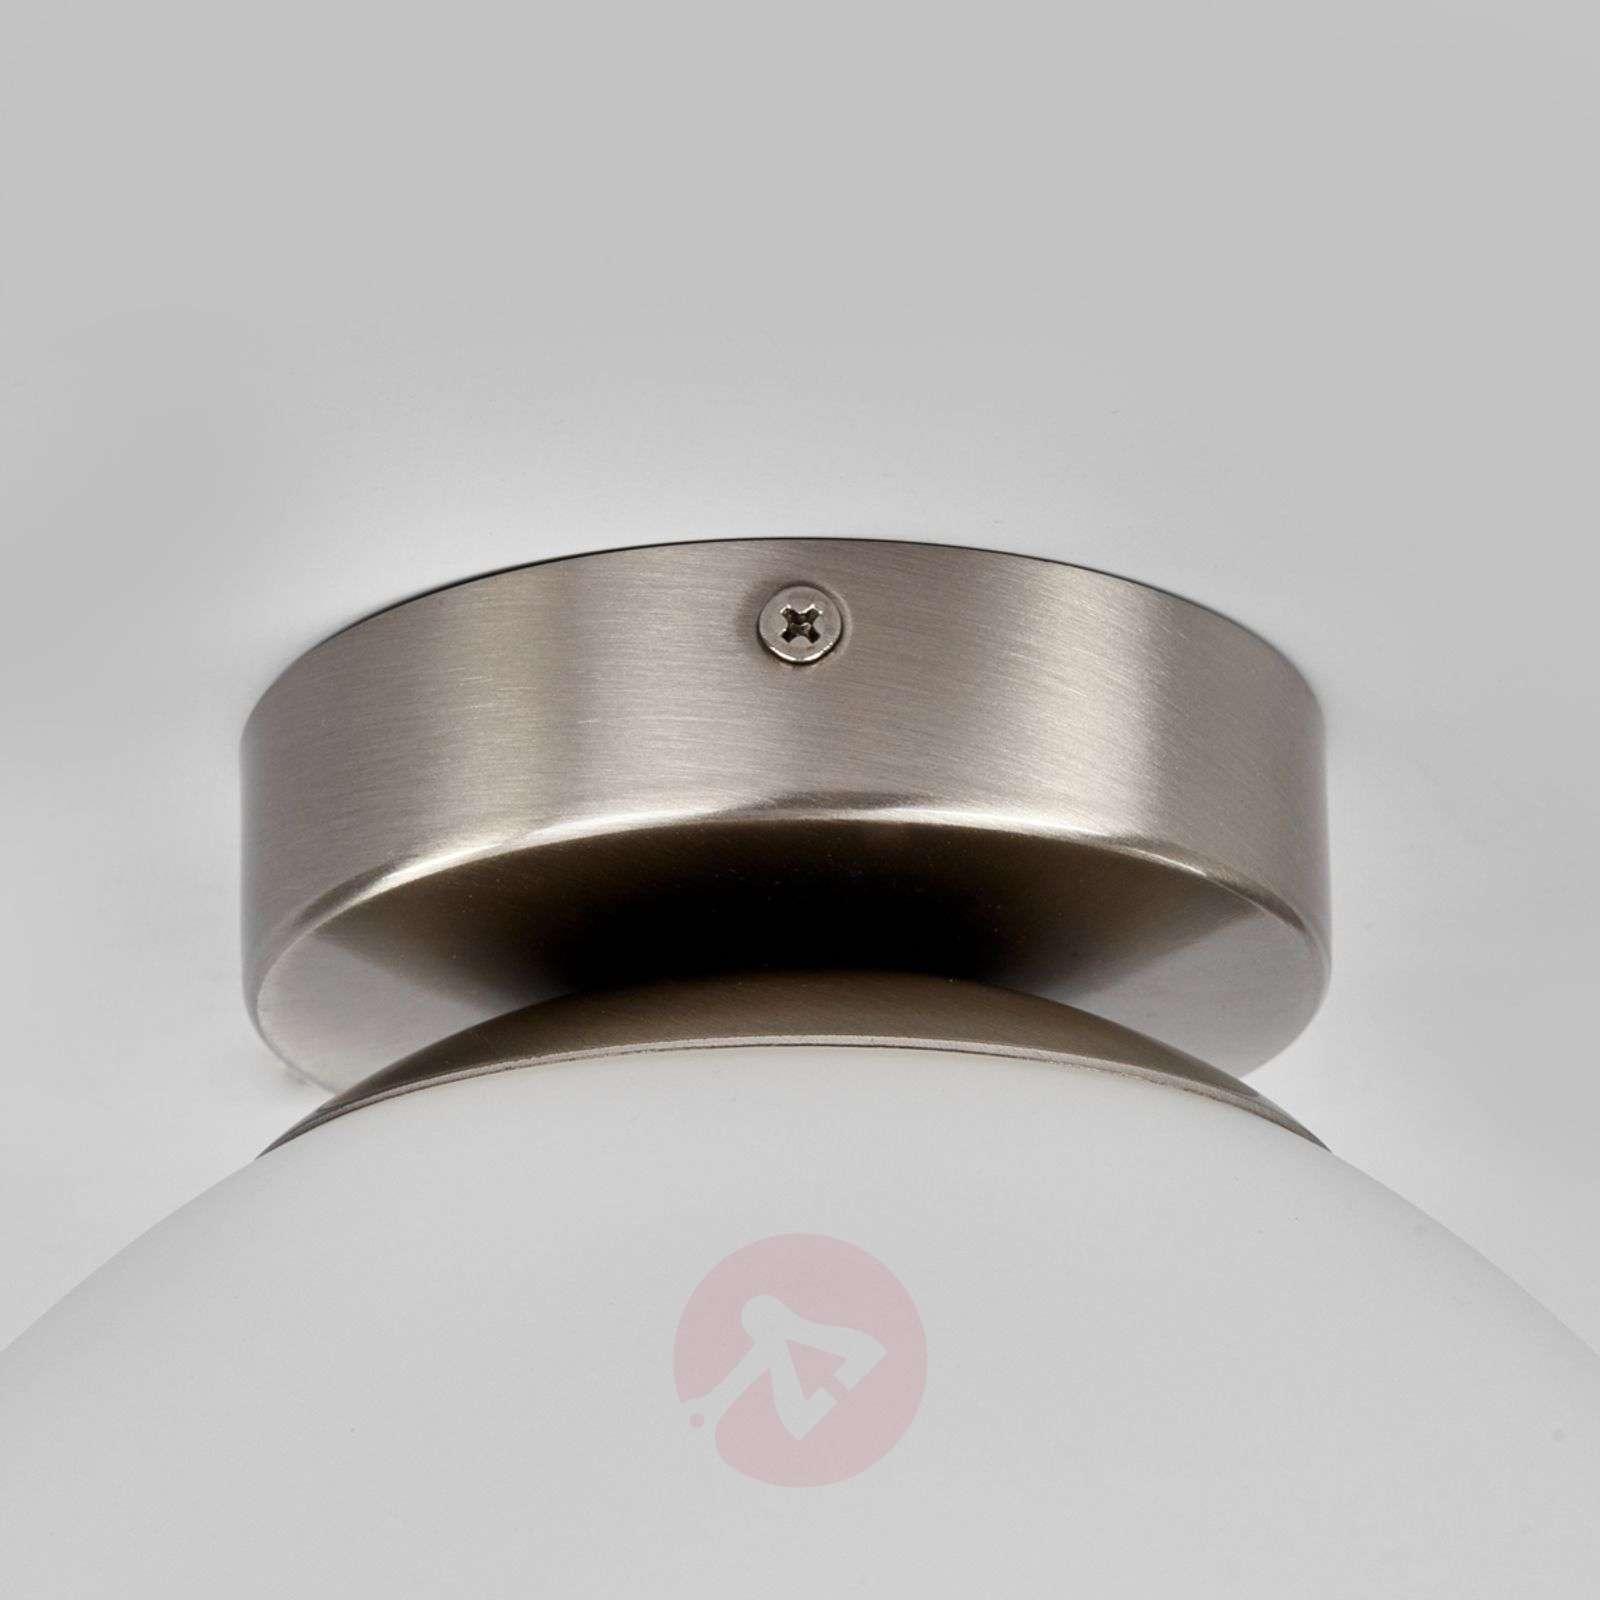 Round bathroom ceiling light Lennie-9641066-02